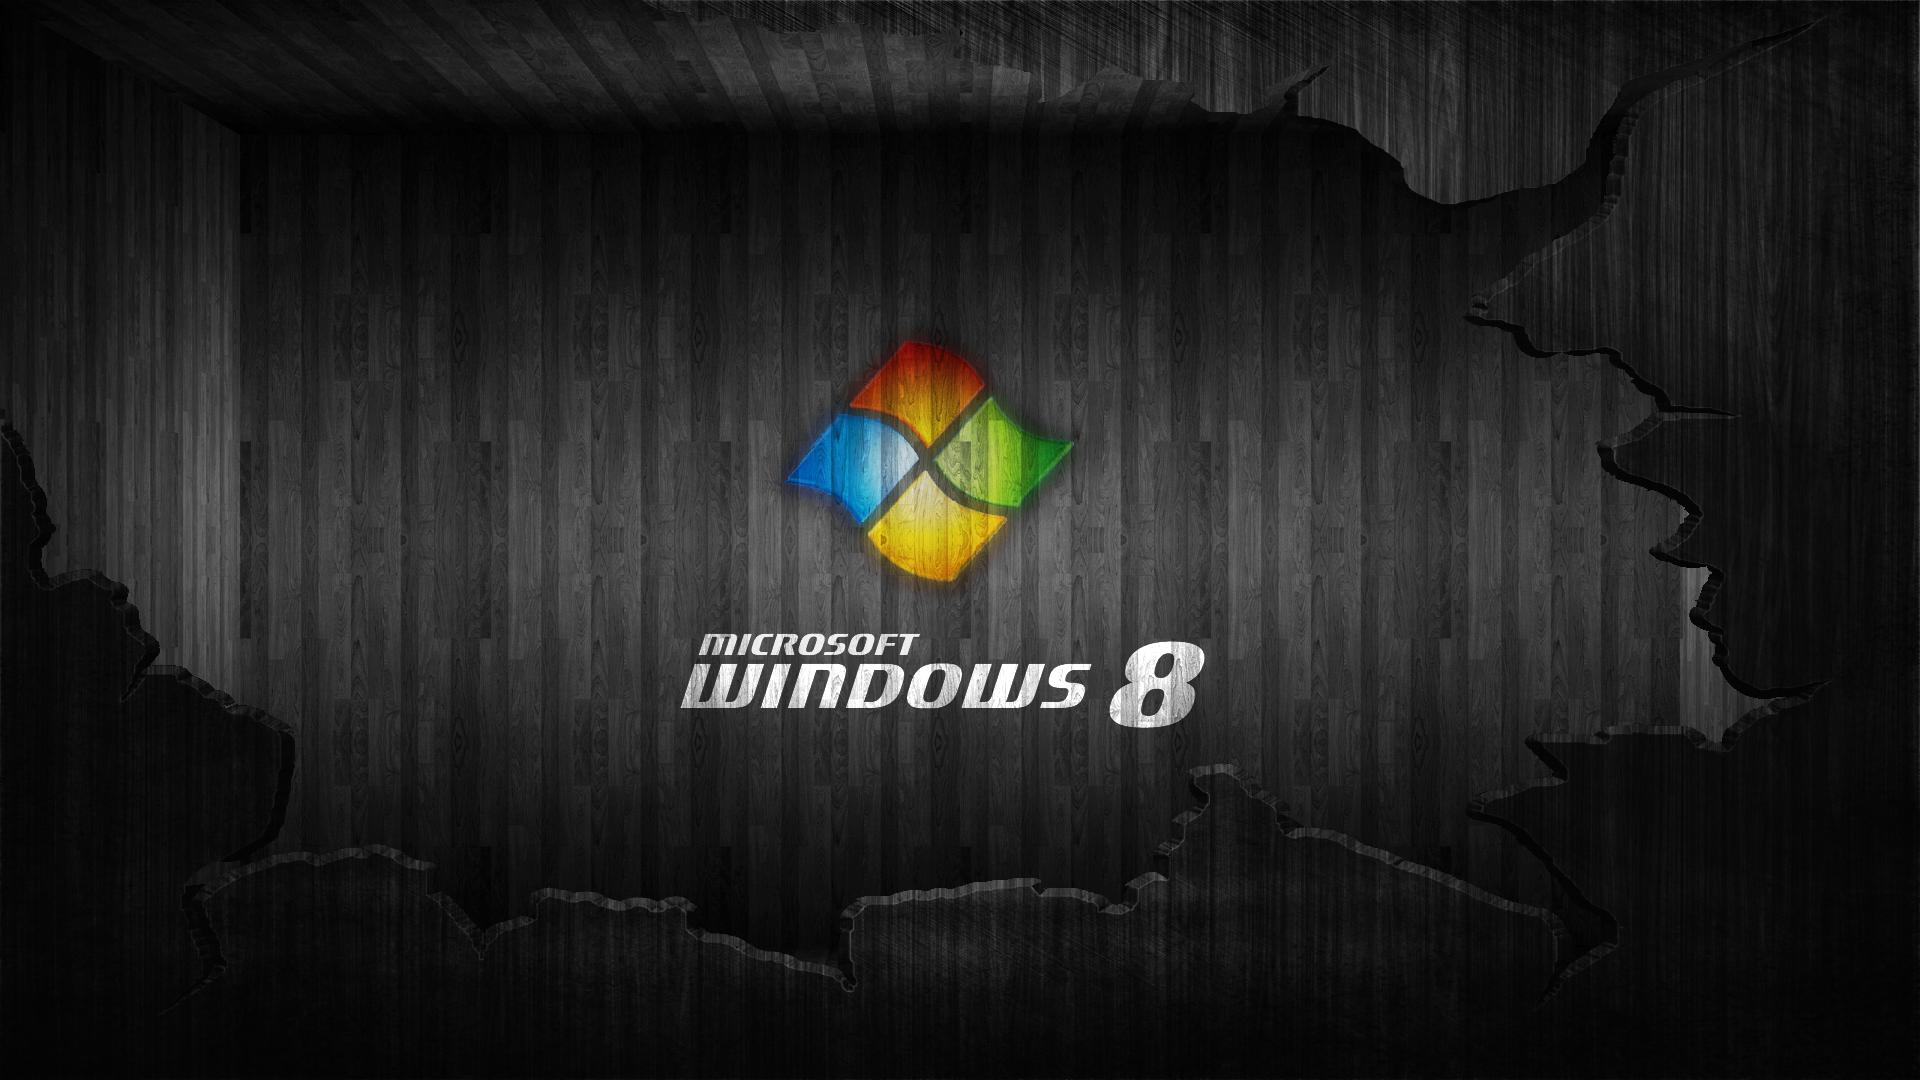 20 Widescreen HD Wallpapers For Windows 8 Desktop Background. Free HD Windows 8 Wallpaper   WallpaperSafari